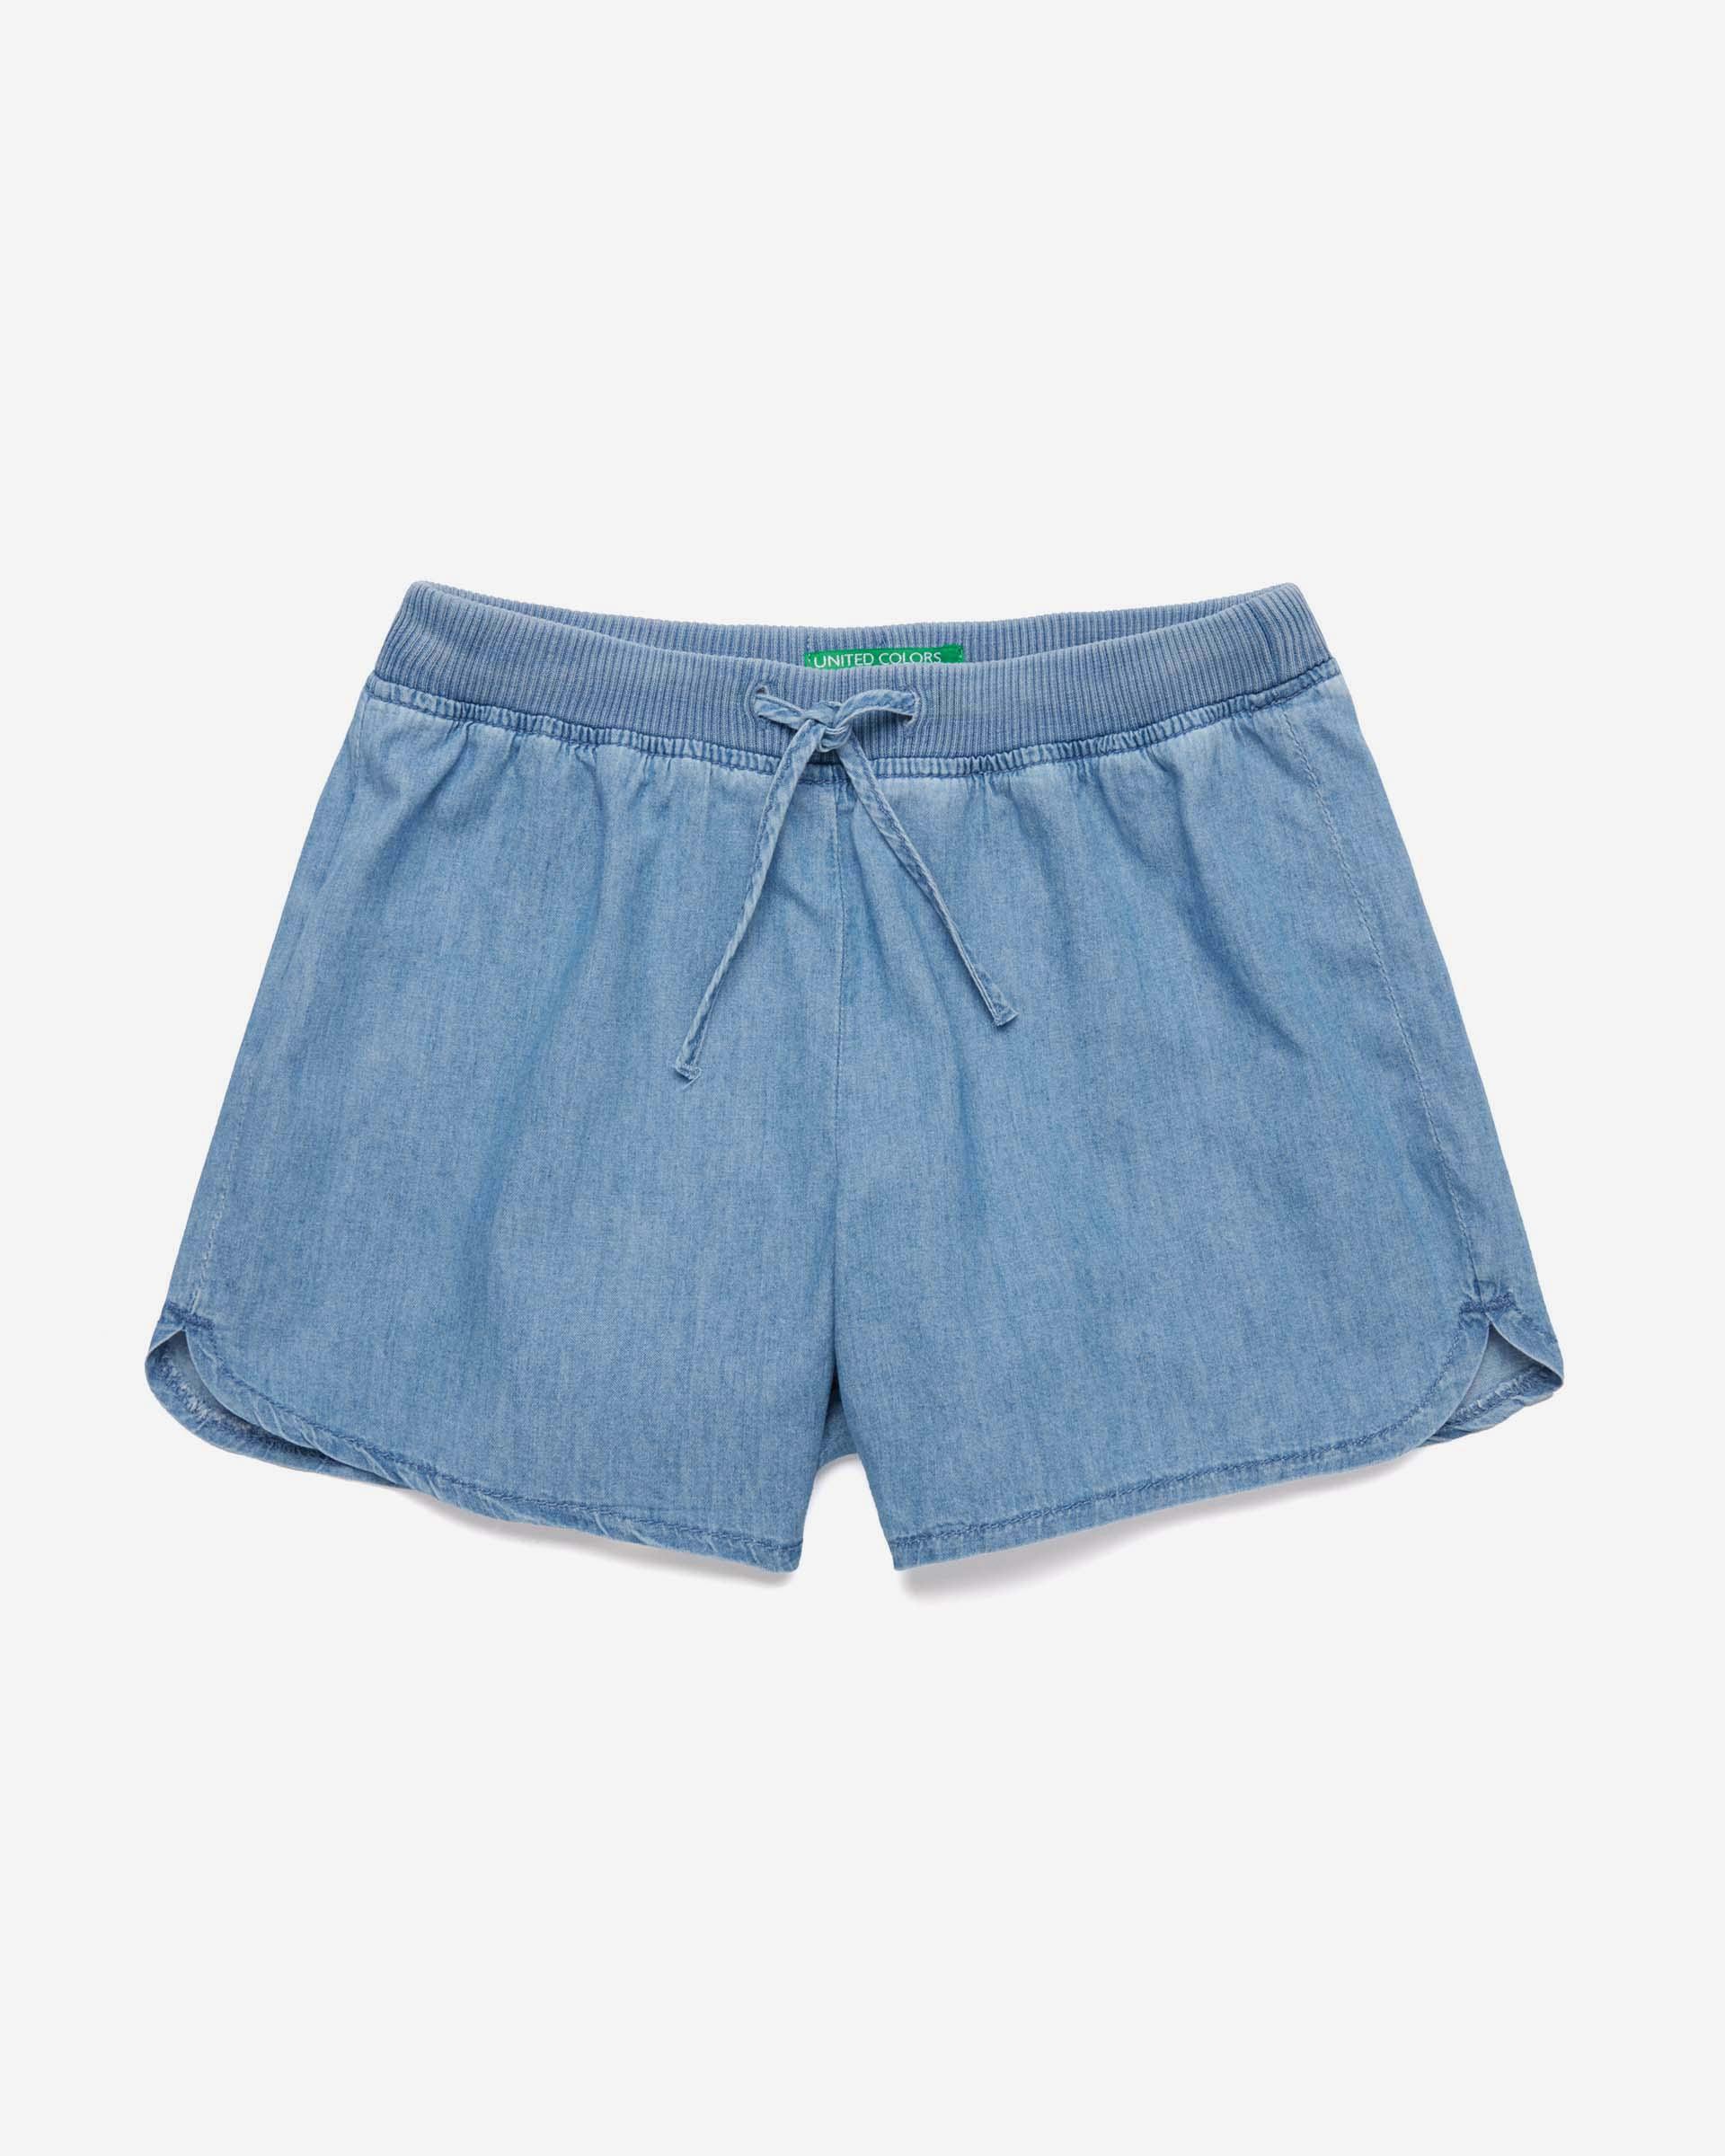 Купить 20P_4DHJ59E30_902, Шорты для девочек Benetton 4DHJ59E30_902 р-р 122, United Colors of Benetton